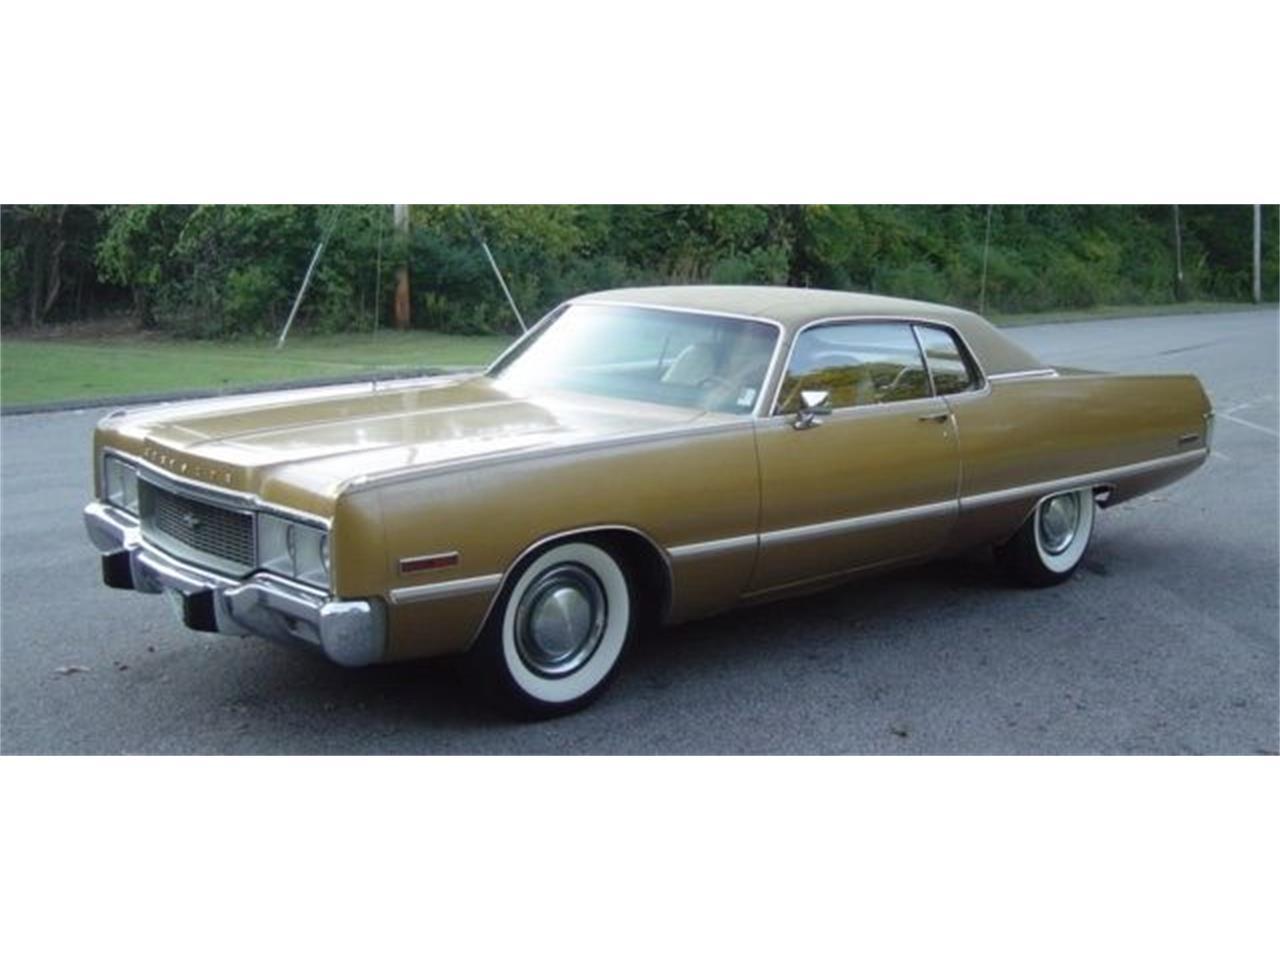 1973 Chrysler Newport (CC-1270912) for sale in Hendersonville, Tennessee